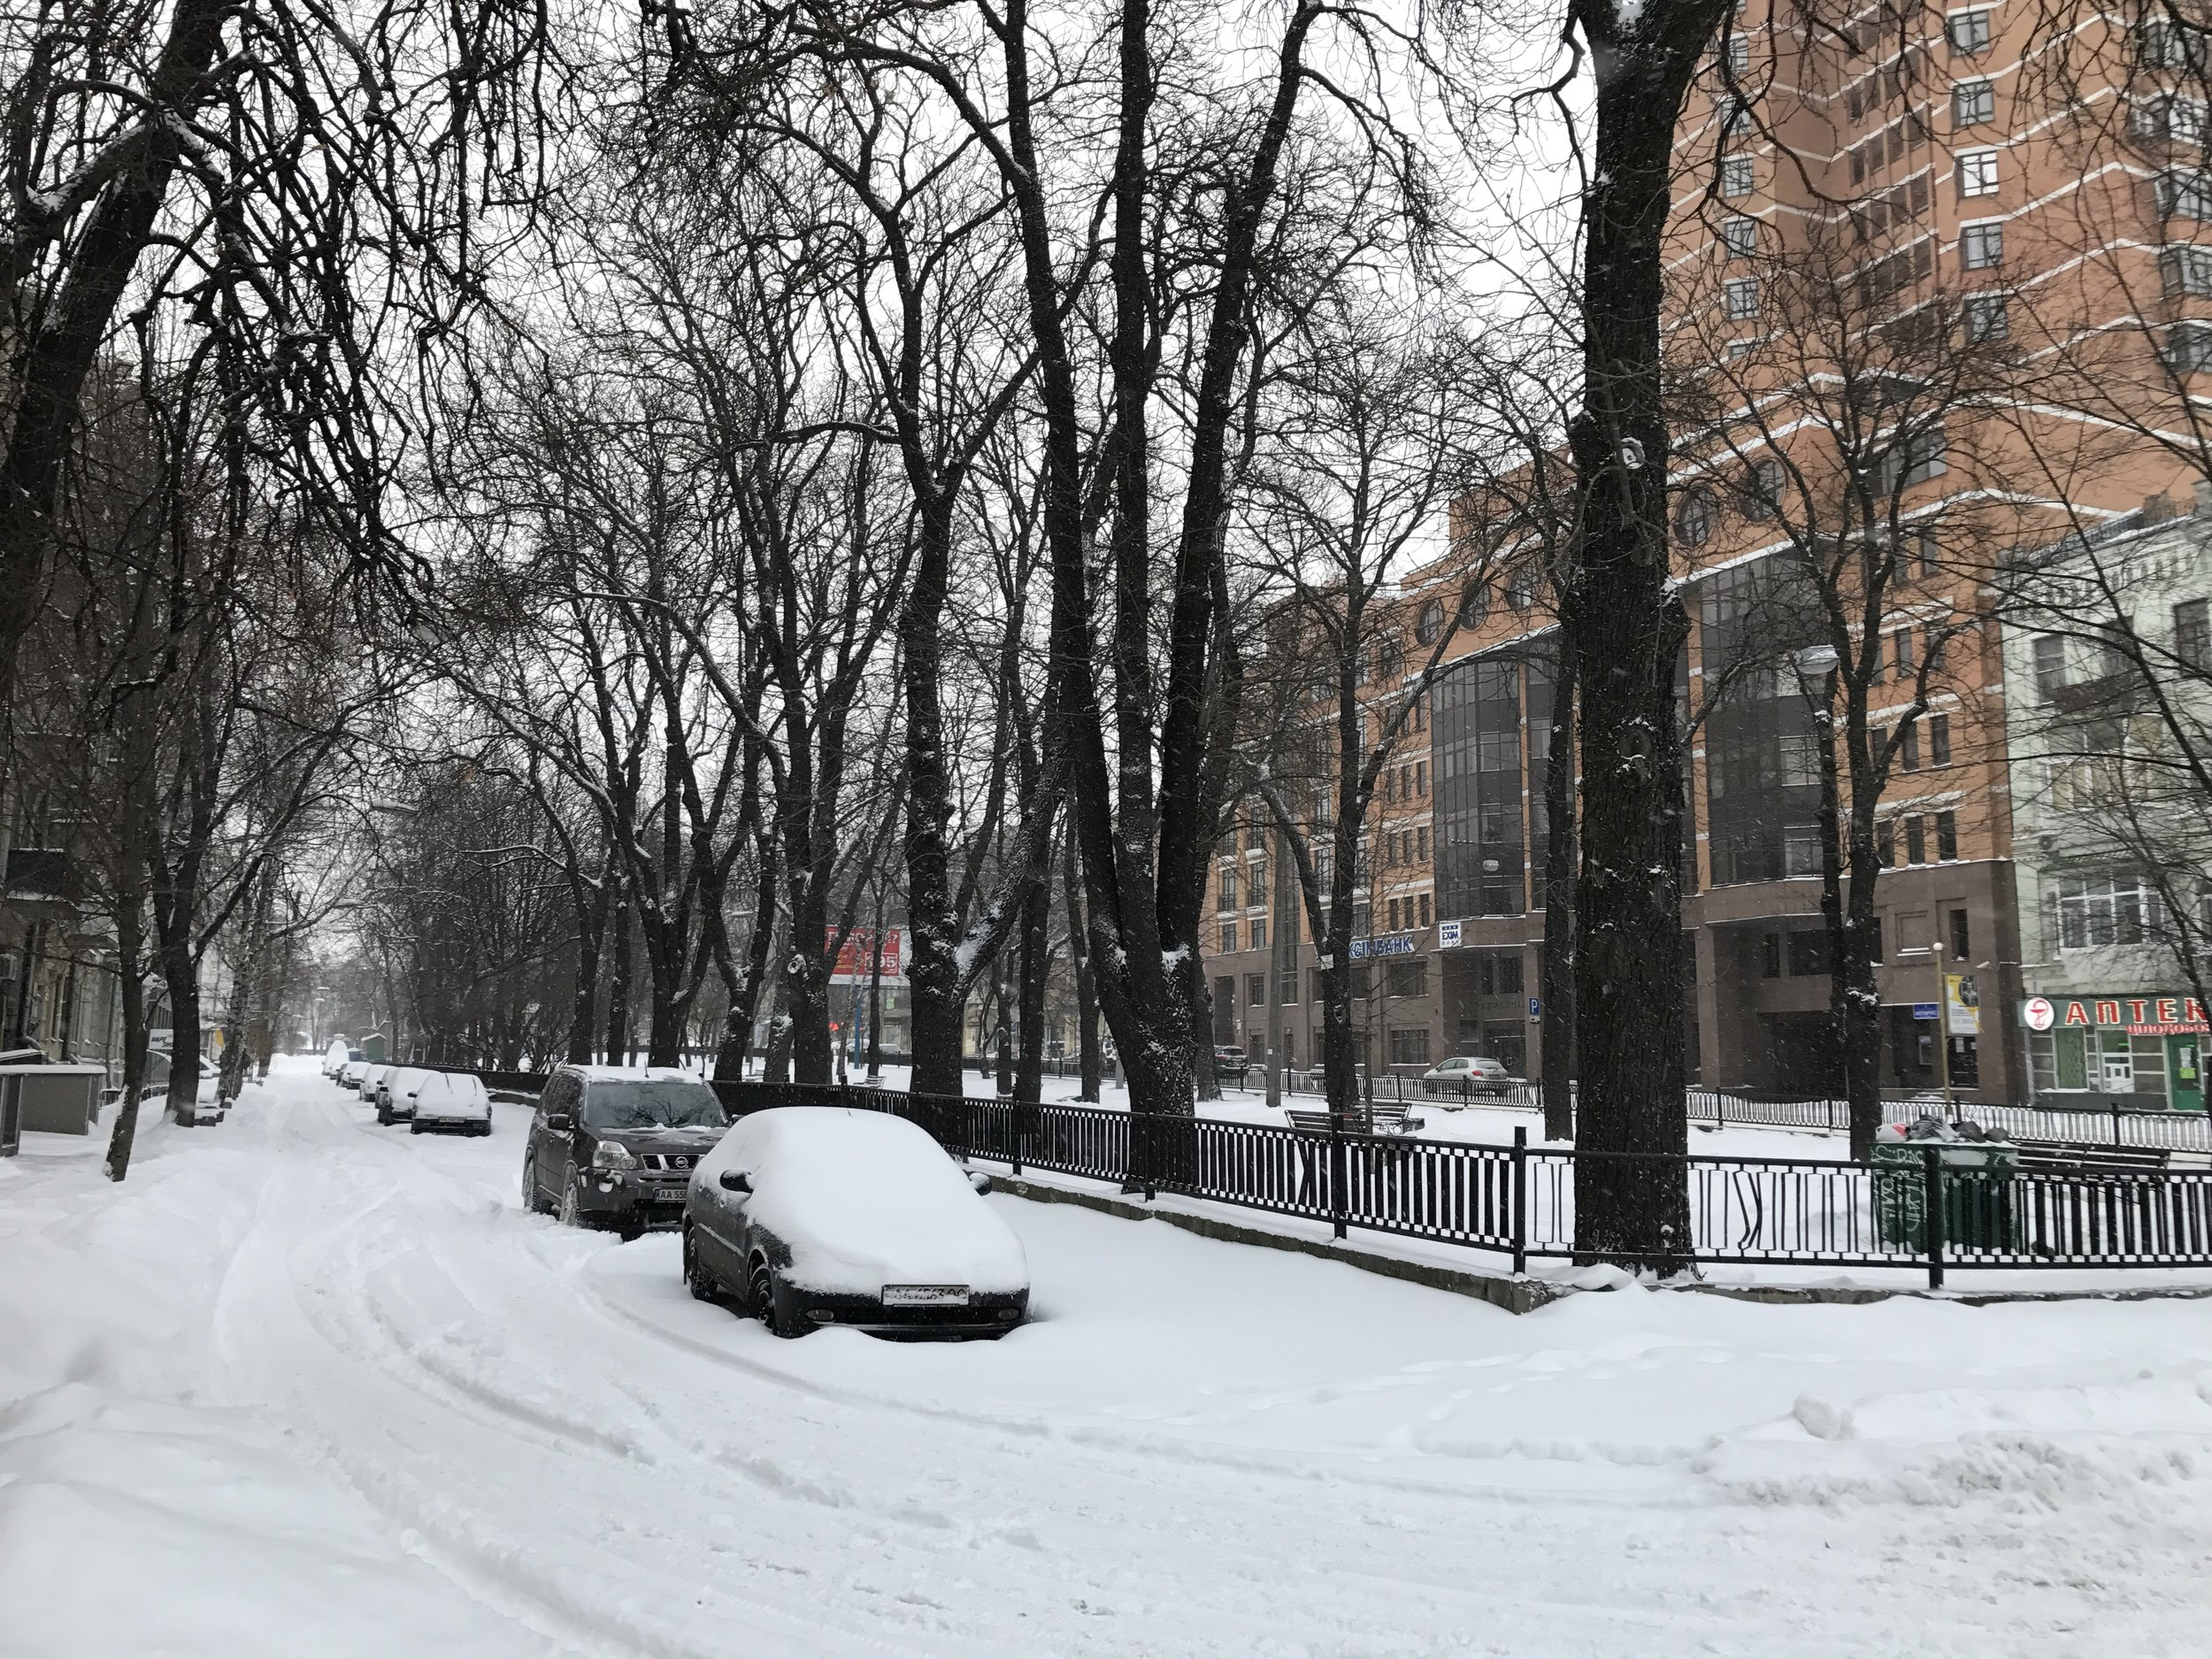 Snowy street in Kyiv, Ukraine